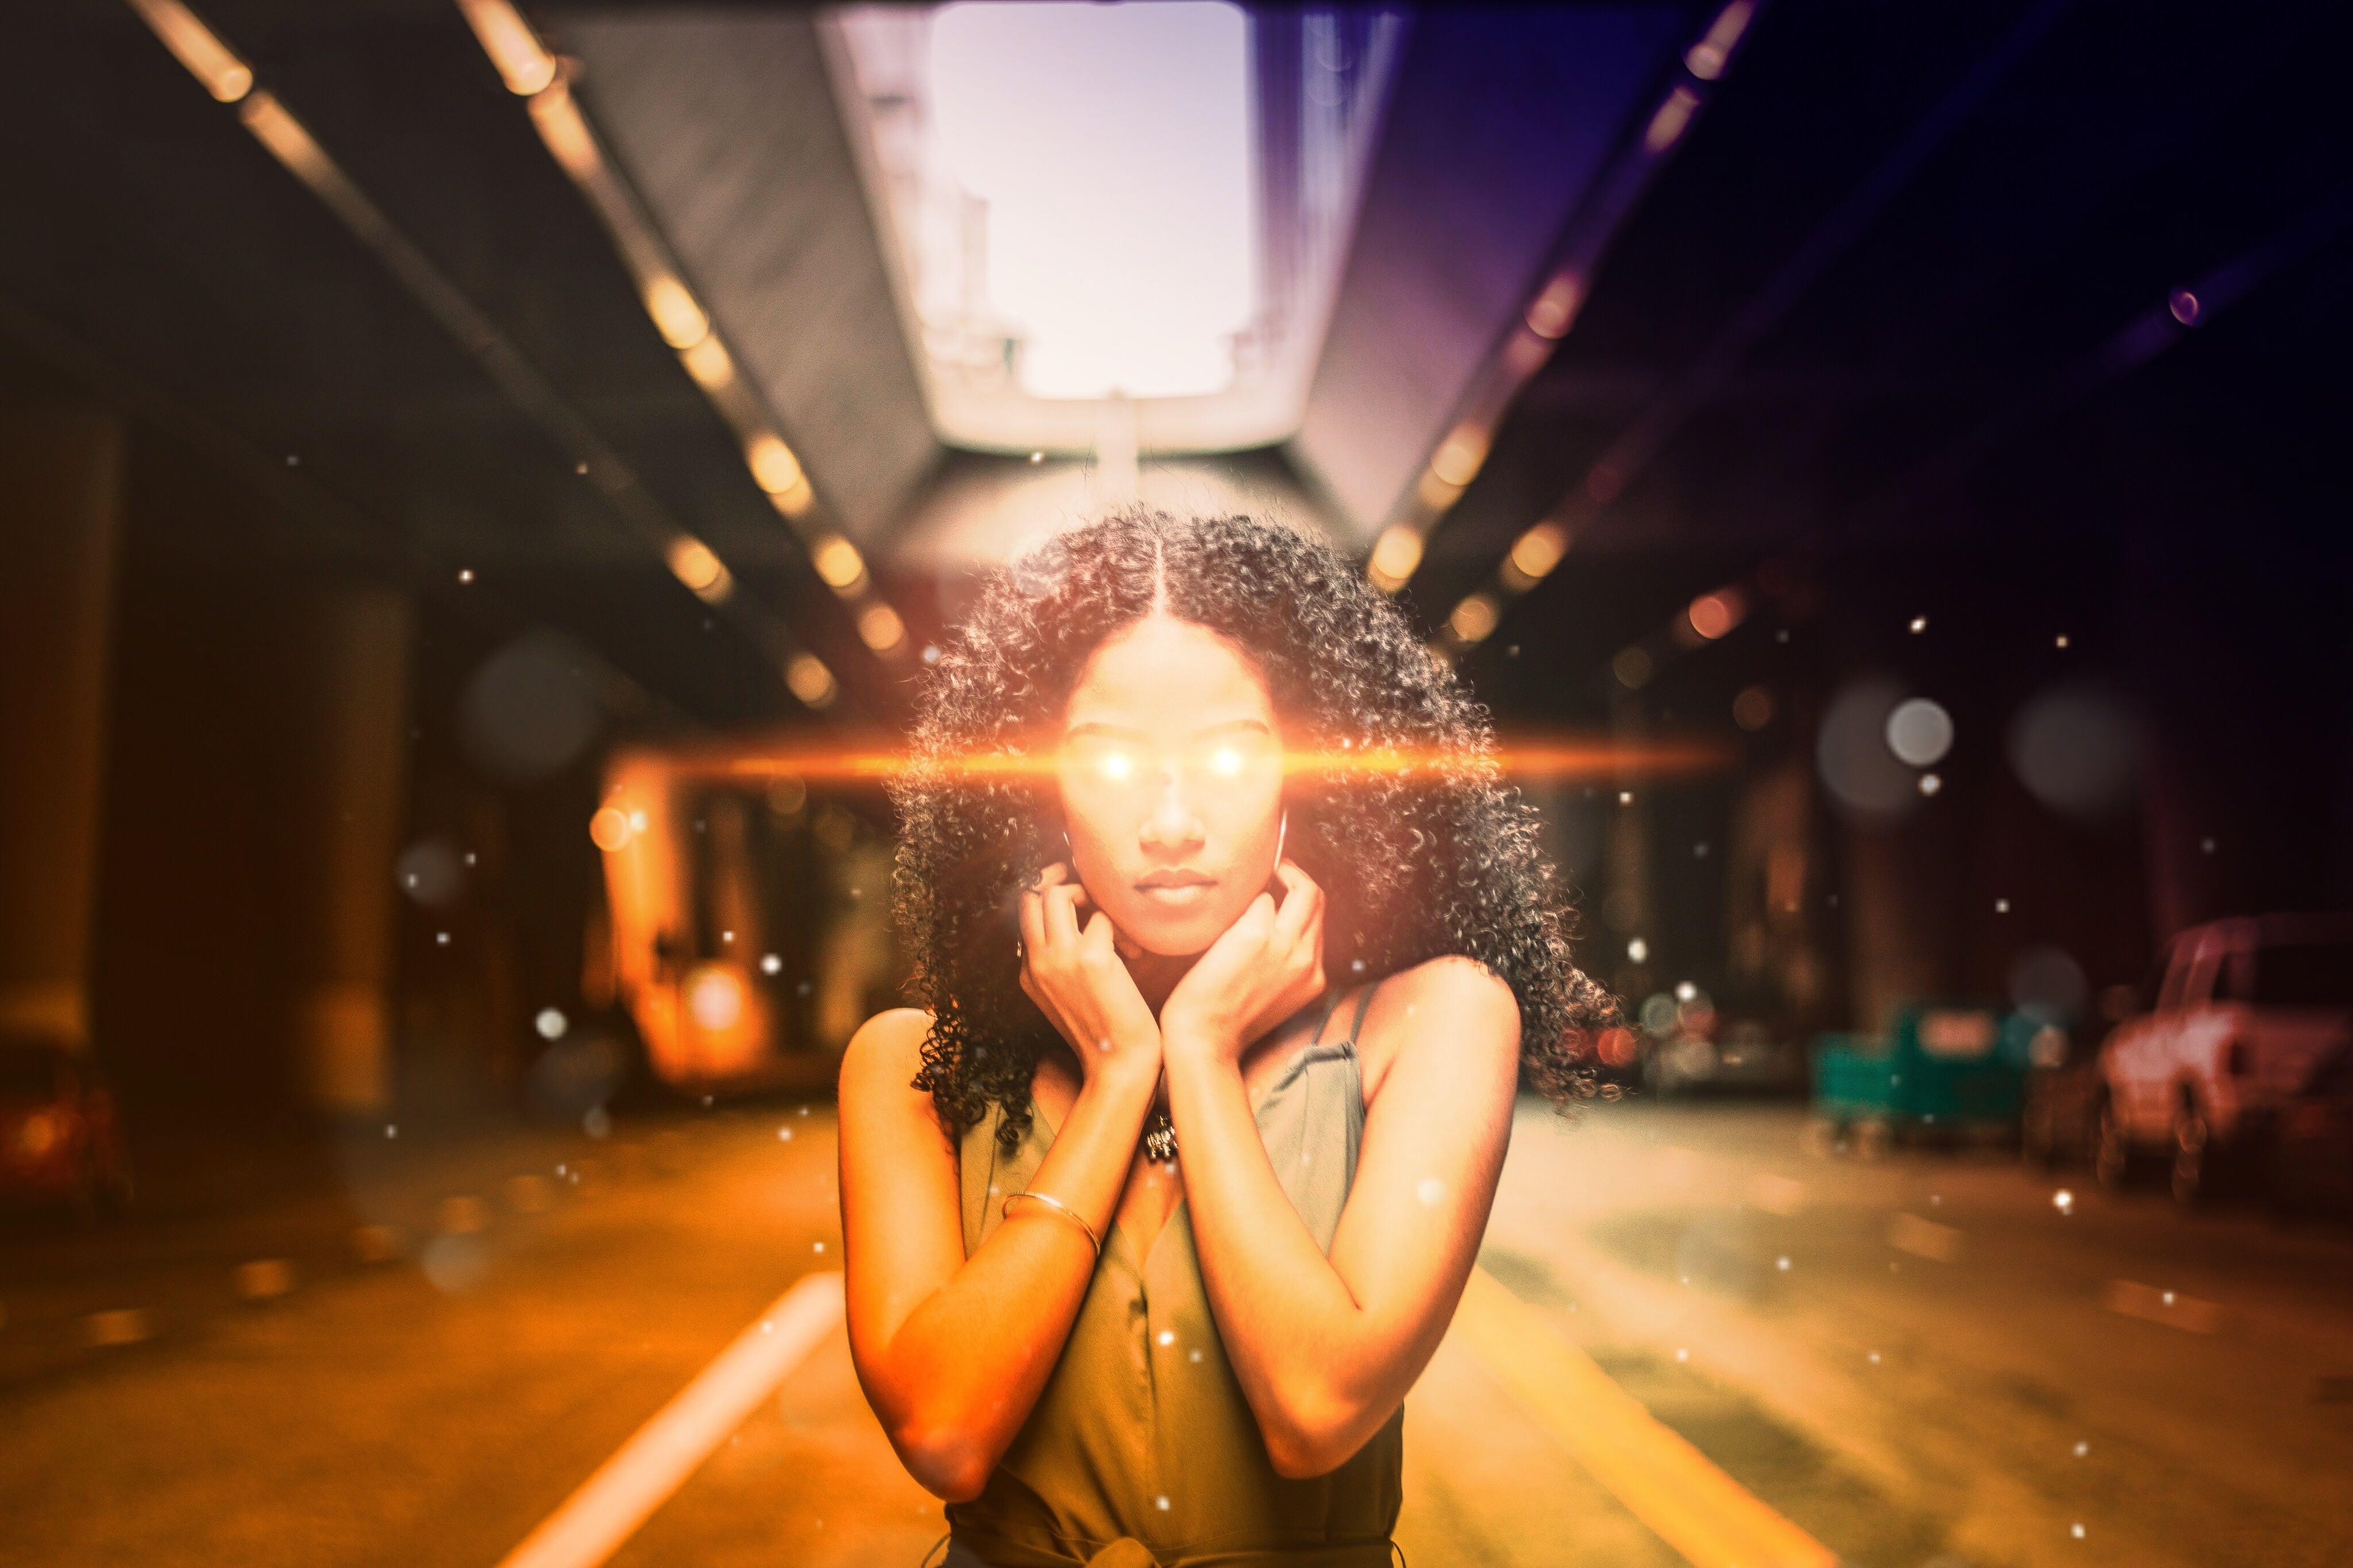 The Captain Marvel Laser Eye Effect on the portrait of a girl